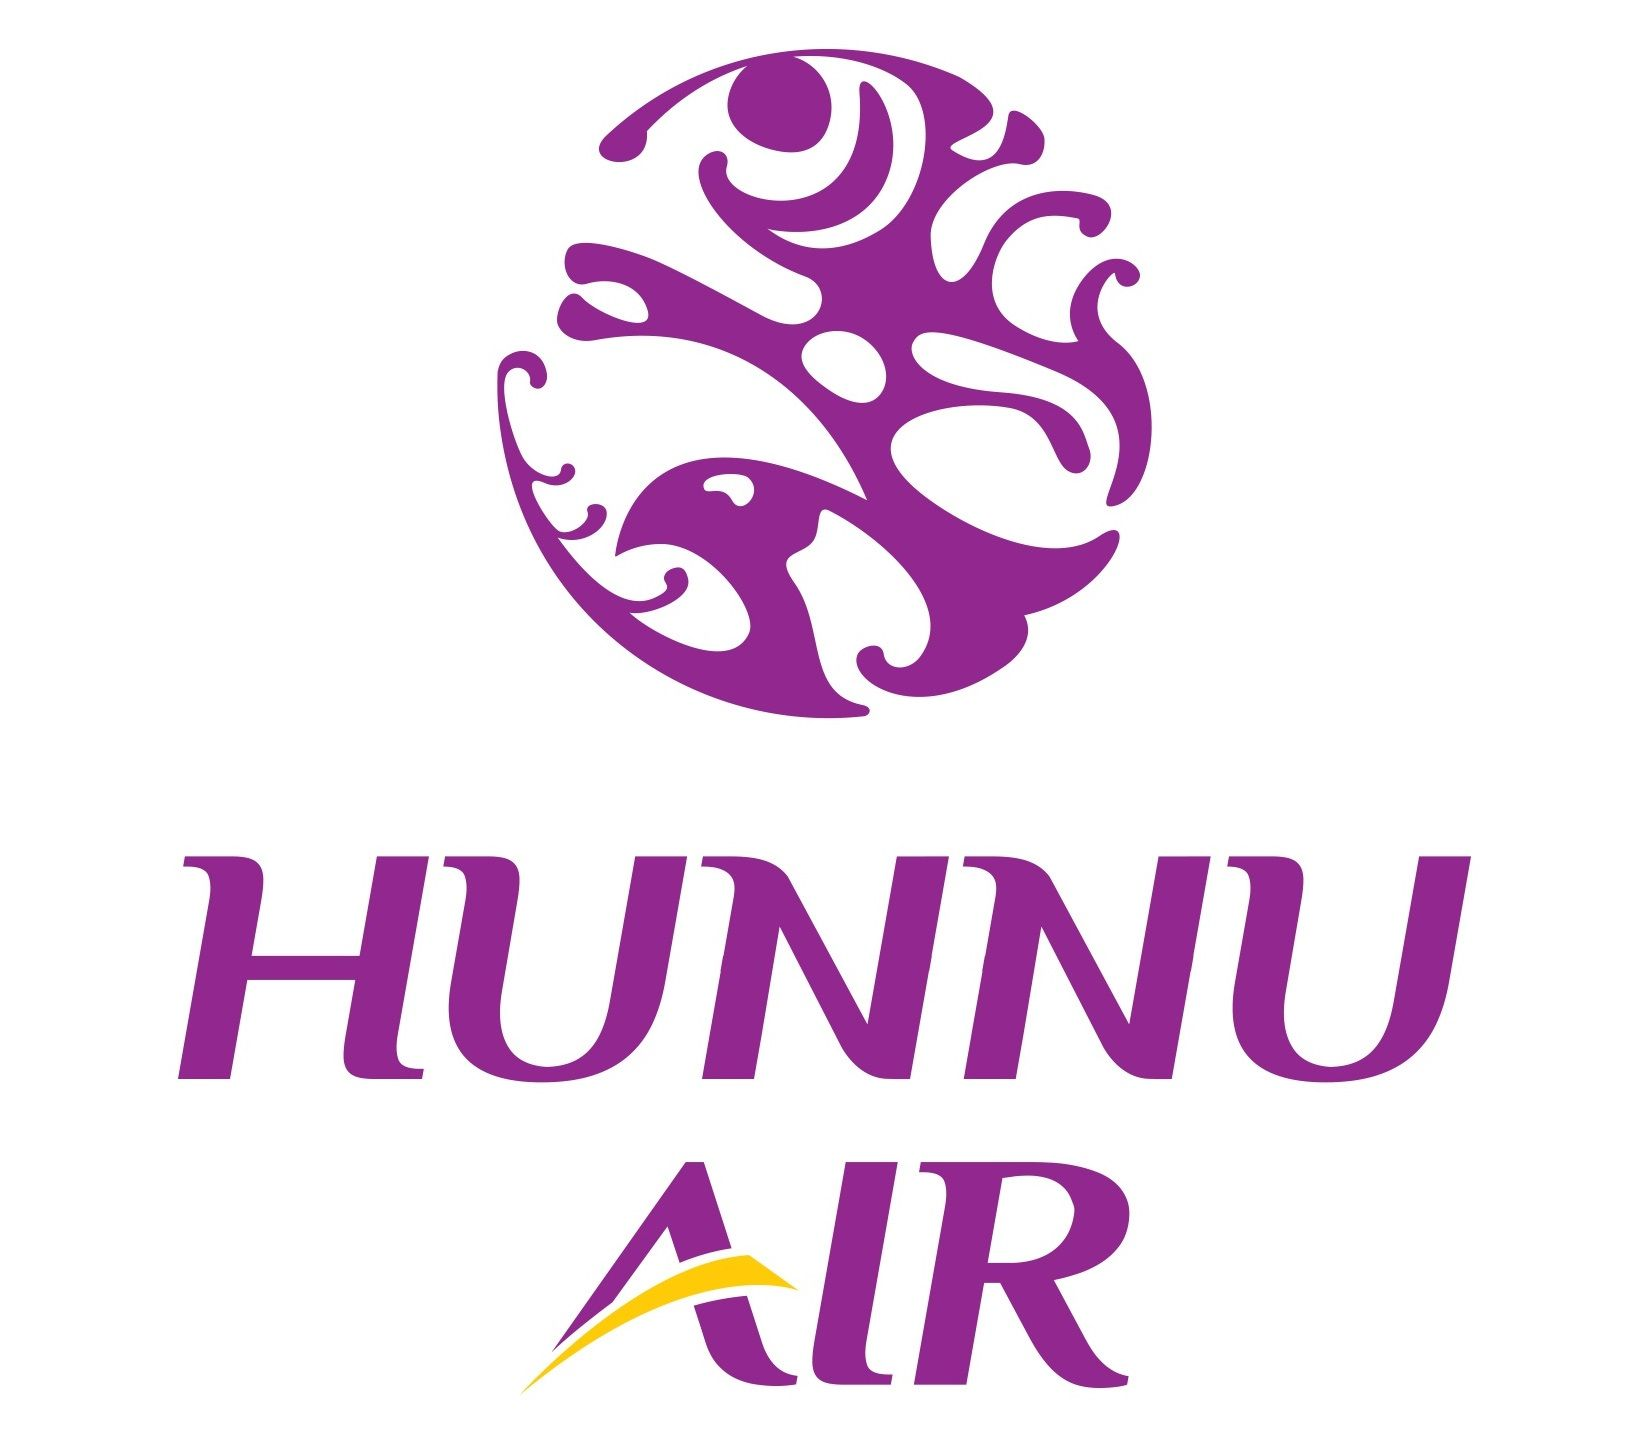 Image Result For Hүnnү Urlag Logos Calligraphy Mongolia